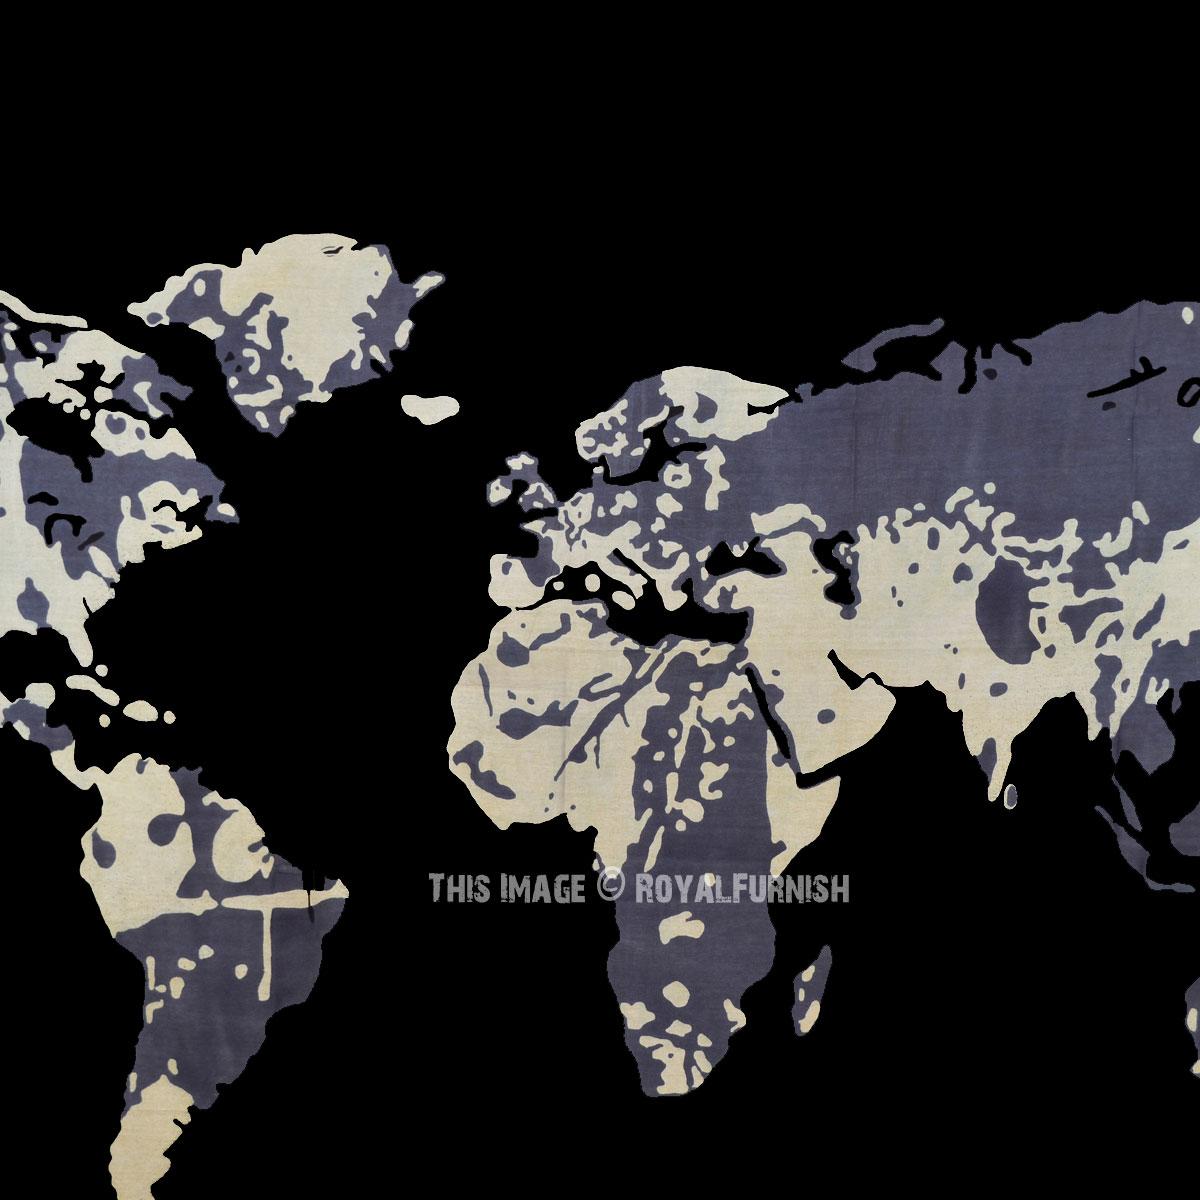 Grey black multi world map wall tapestry atlas bedspread grey black multi world map wall tapestry atlas bedspread gumiabroncs Gallery